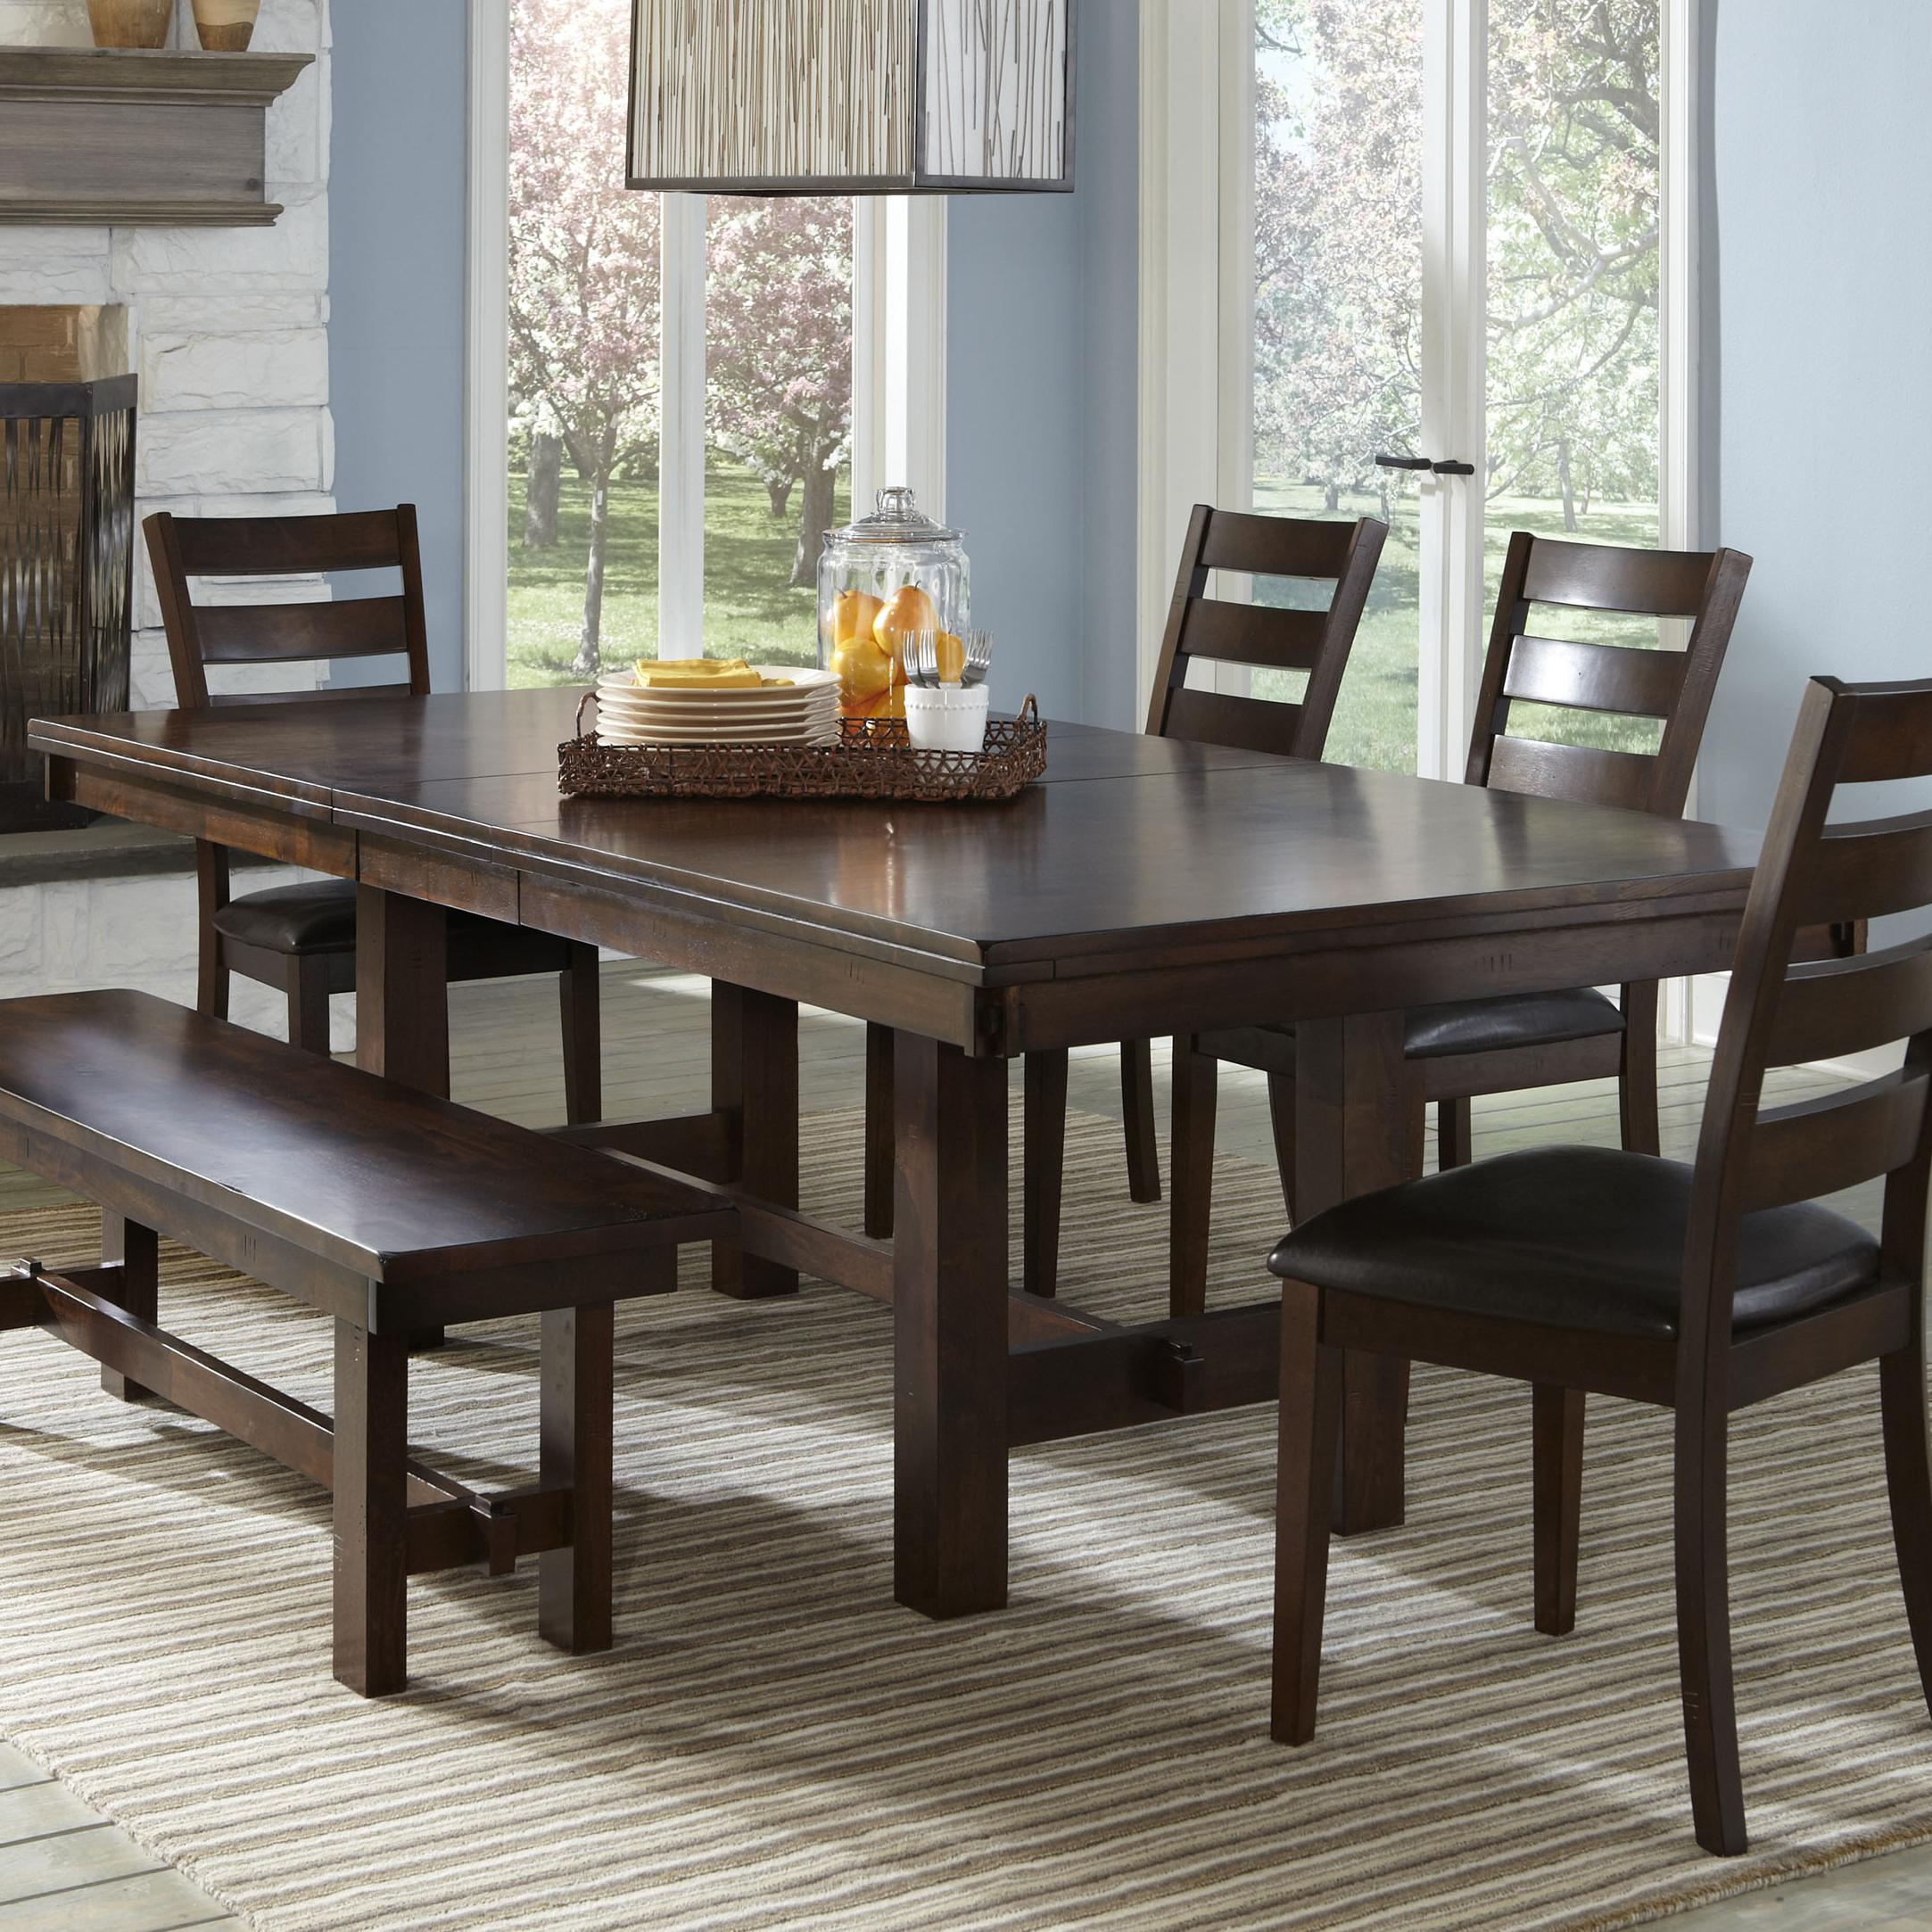 Intercon Kona Trestle Dining Table - Item Number: KA-TA-4492-RAI